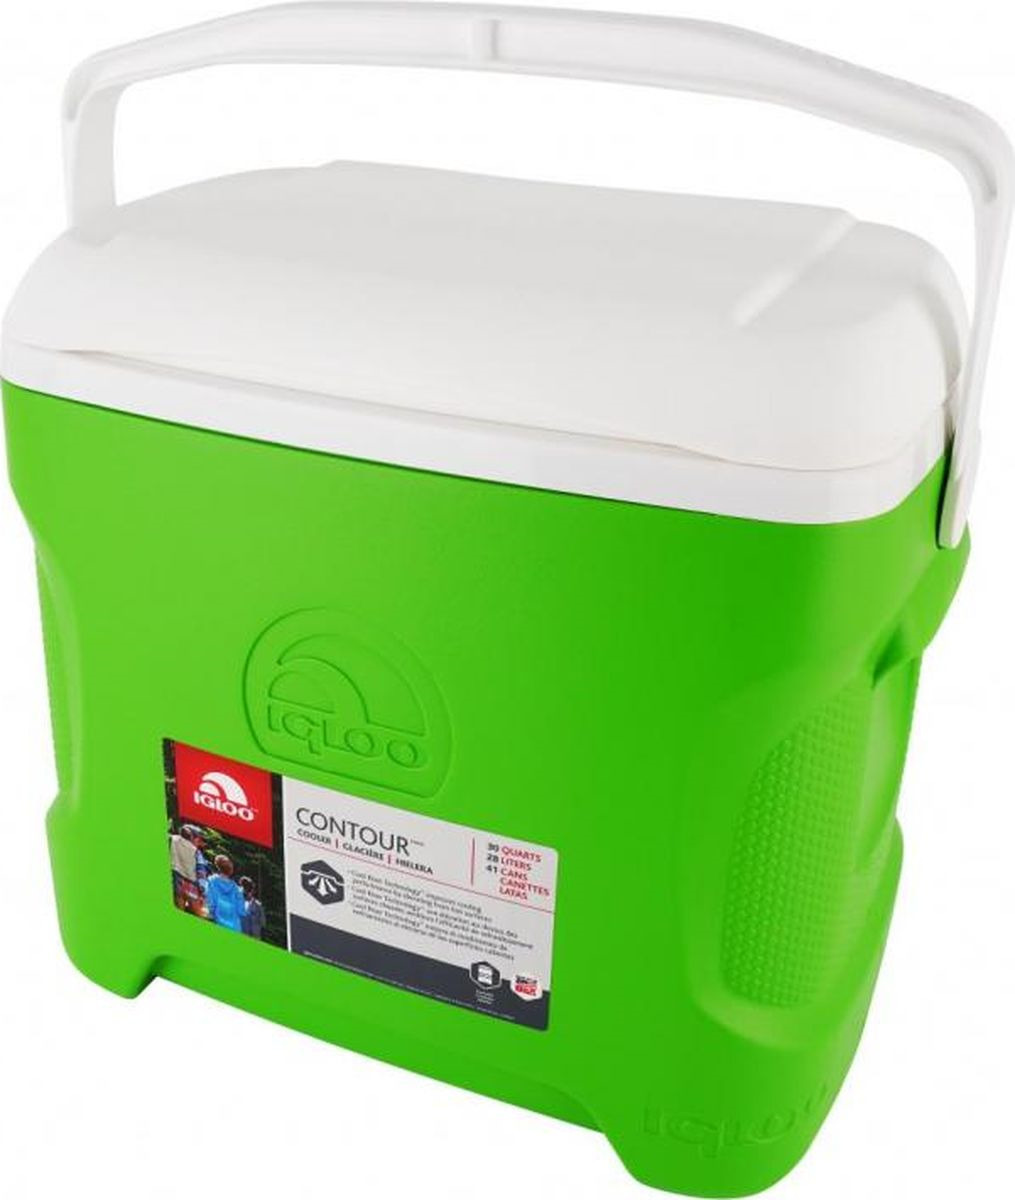 Изотермический контейнер Igloo Contour, 00049794, зеленый, 47 х 34 х 43 см igloo изотермический контейнер igloo playmate pal jucetwh